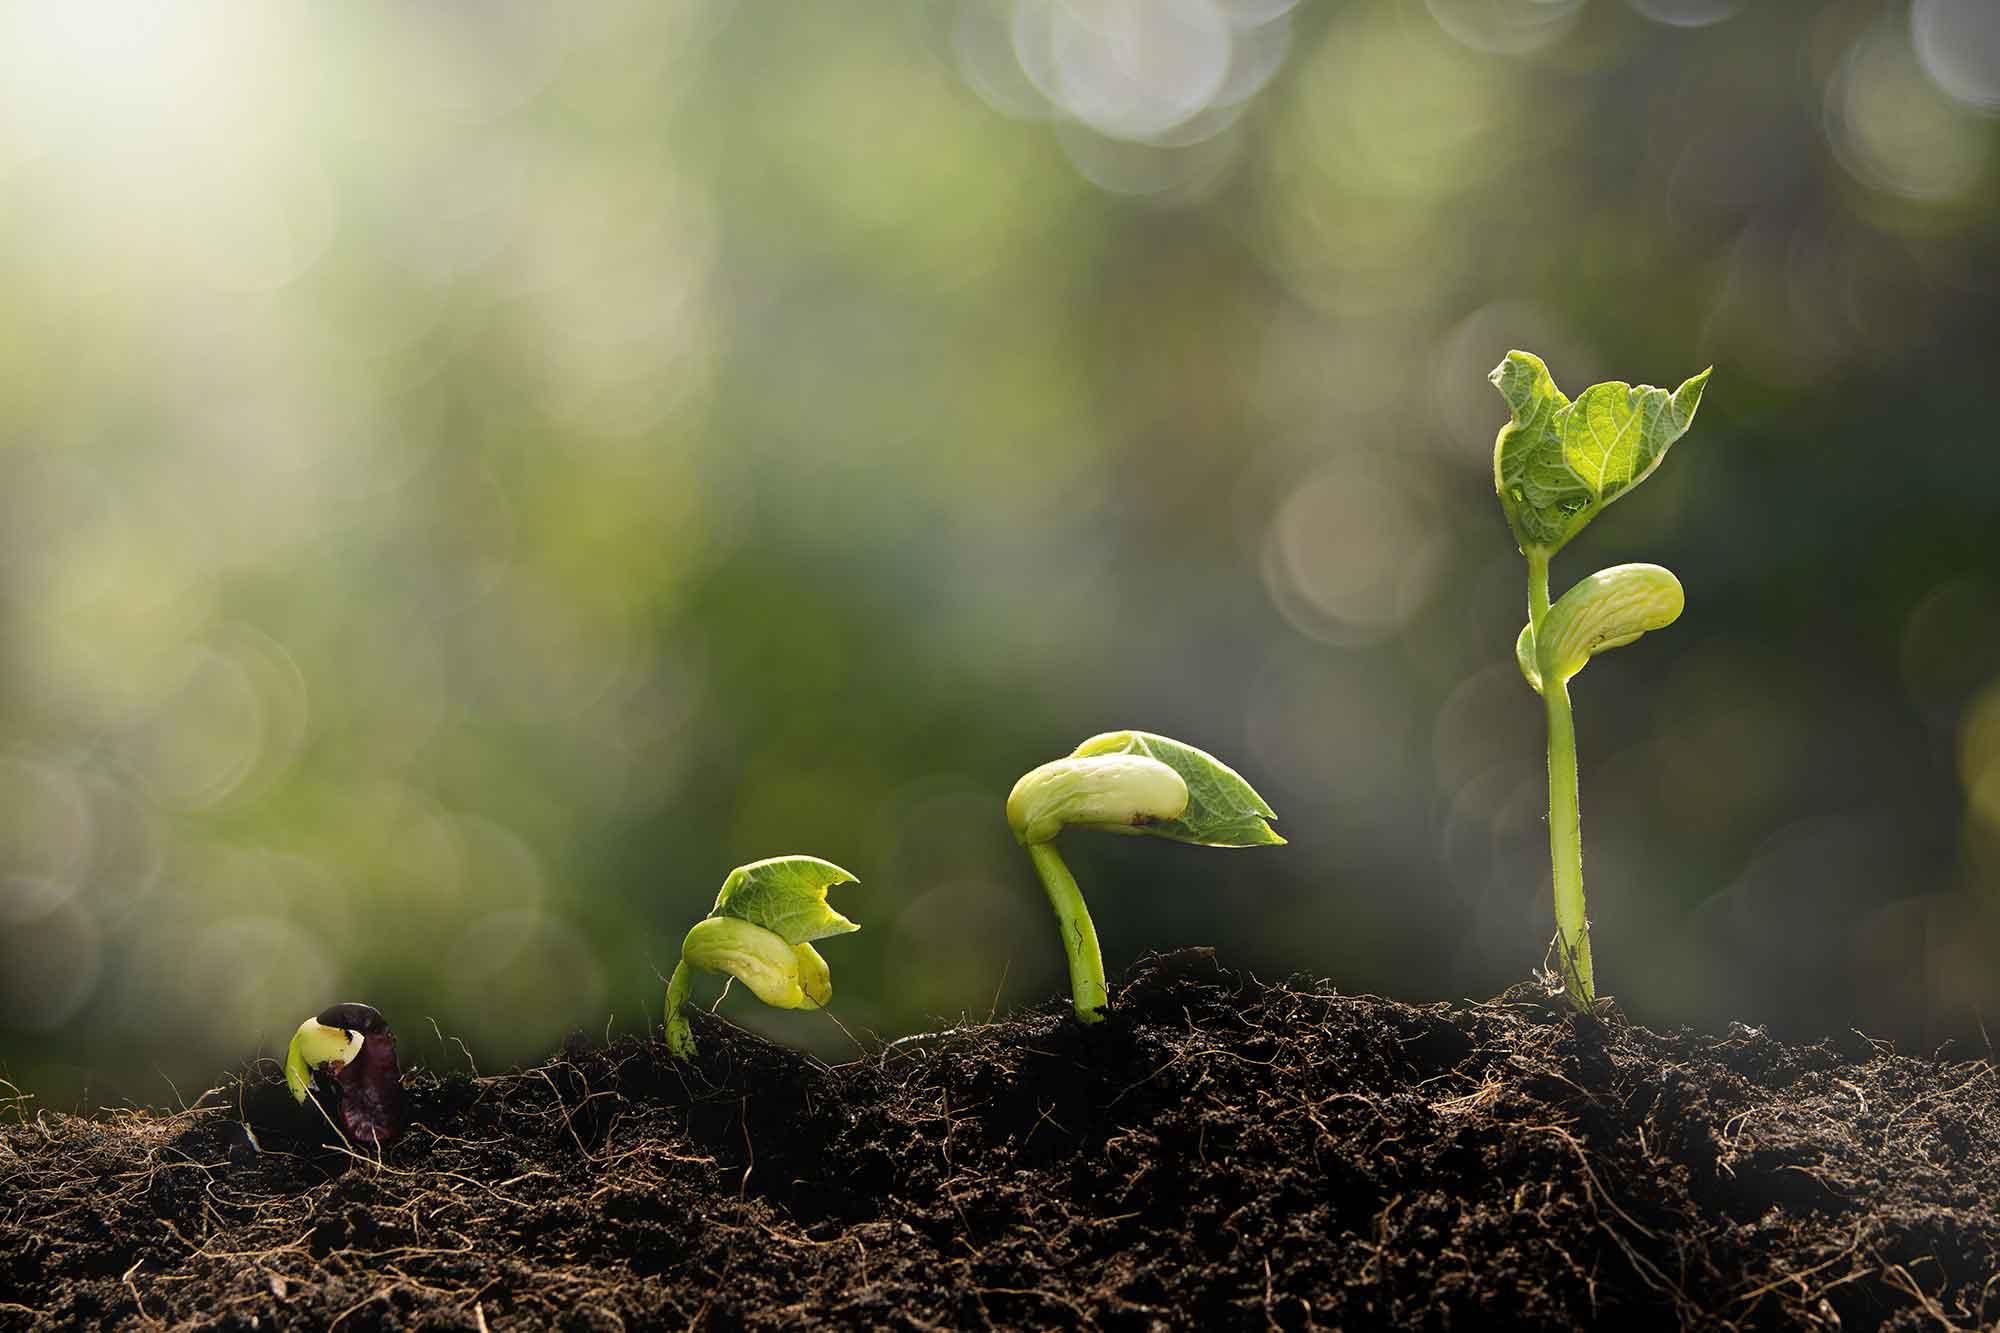 practice growth